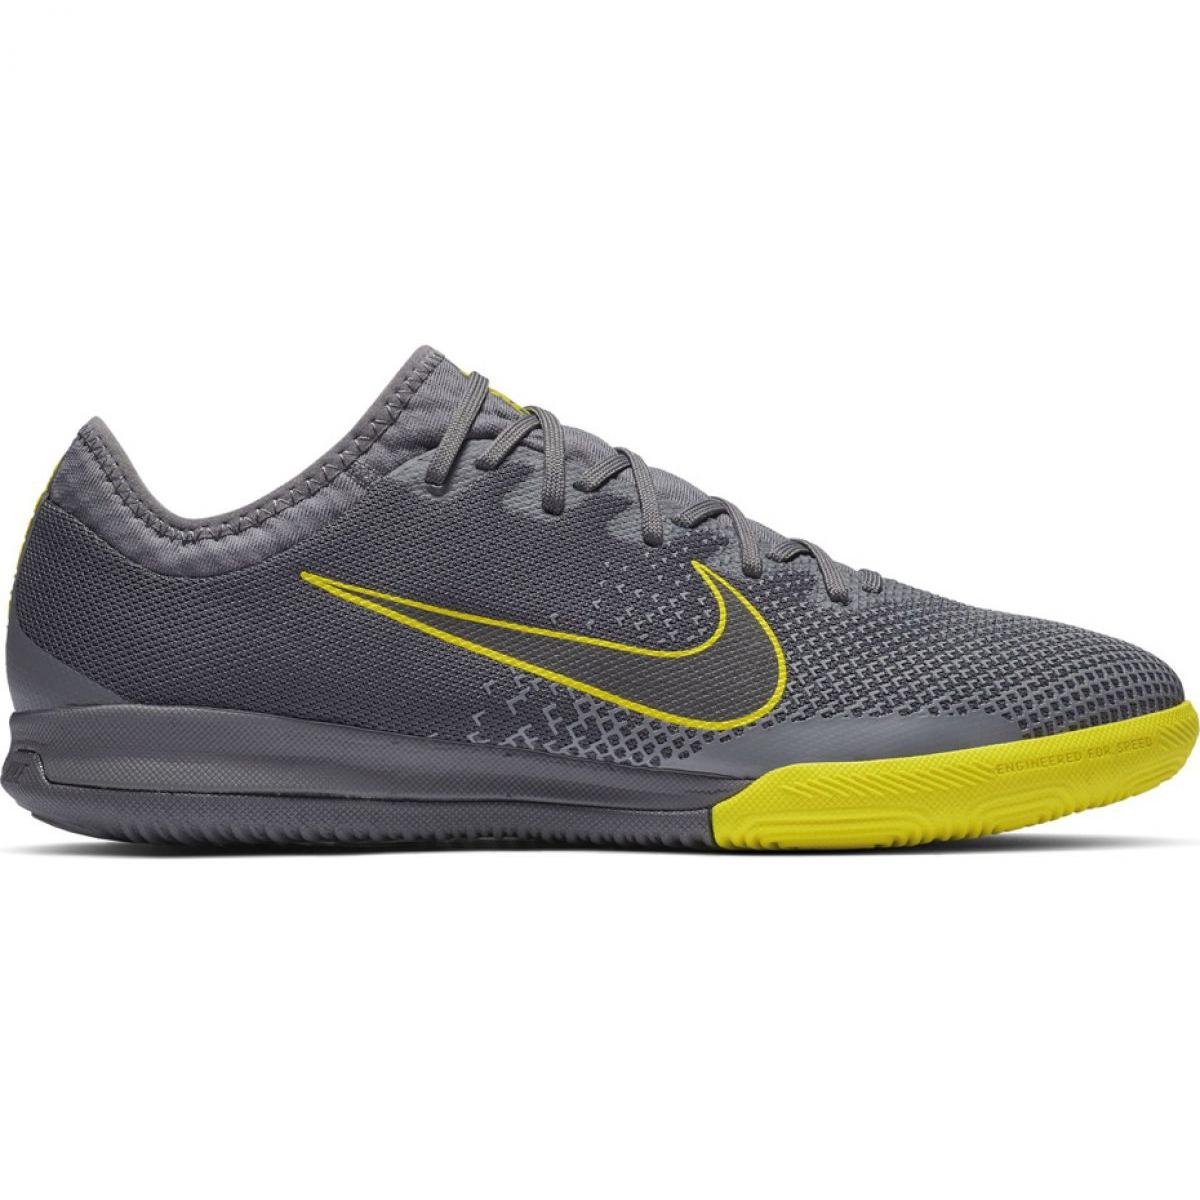 Hallenschuhe Nike Mercurial Vapor 12 Pro Ic M Ah7387 070 Grau Grau Silber